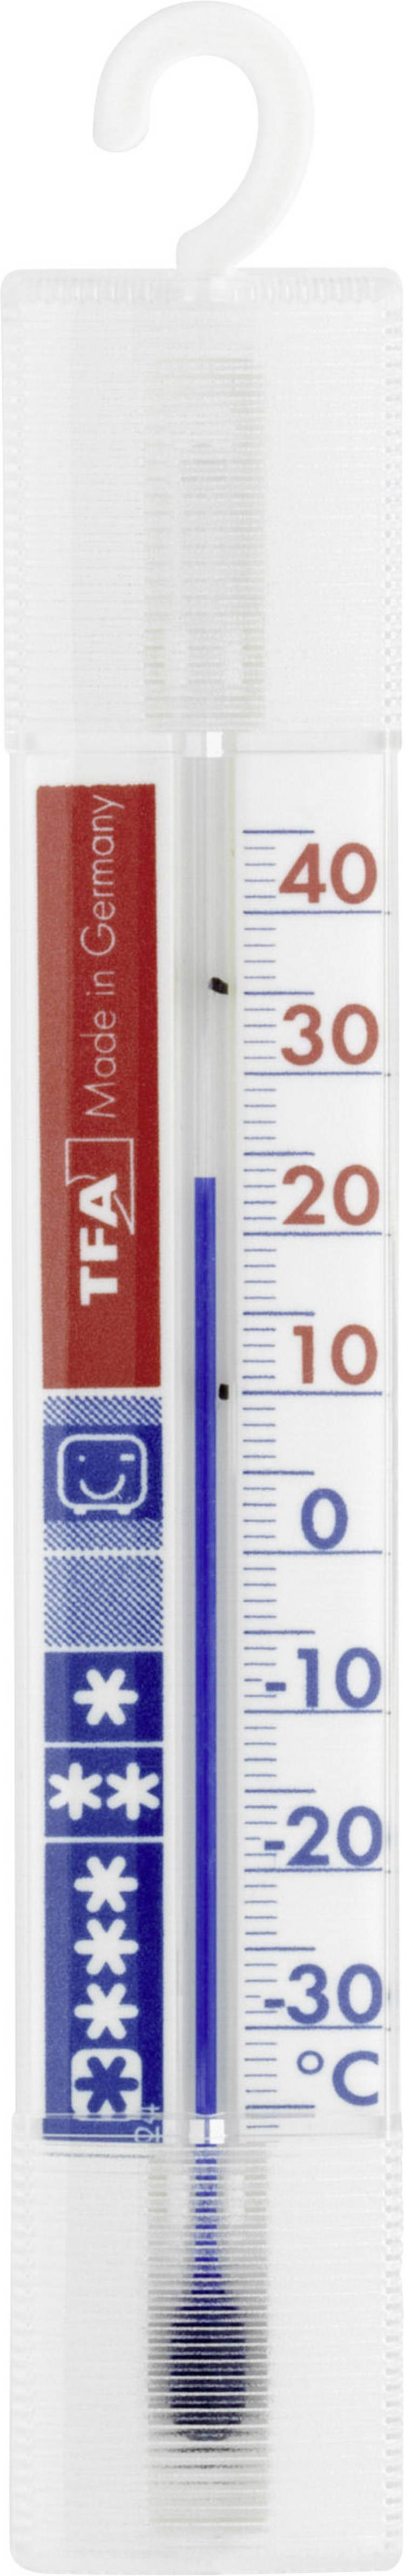 TFA 14.4000 Koelkast- vriesthermometer